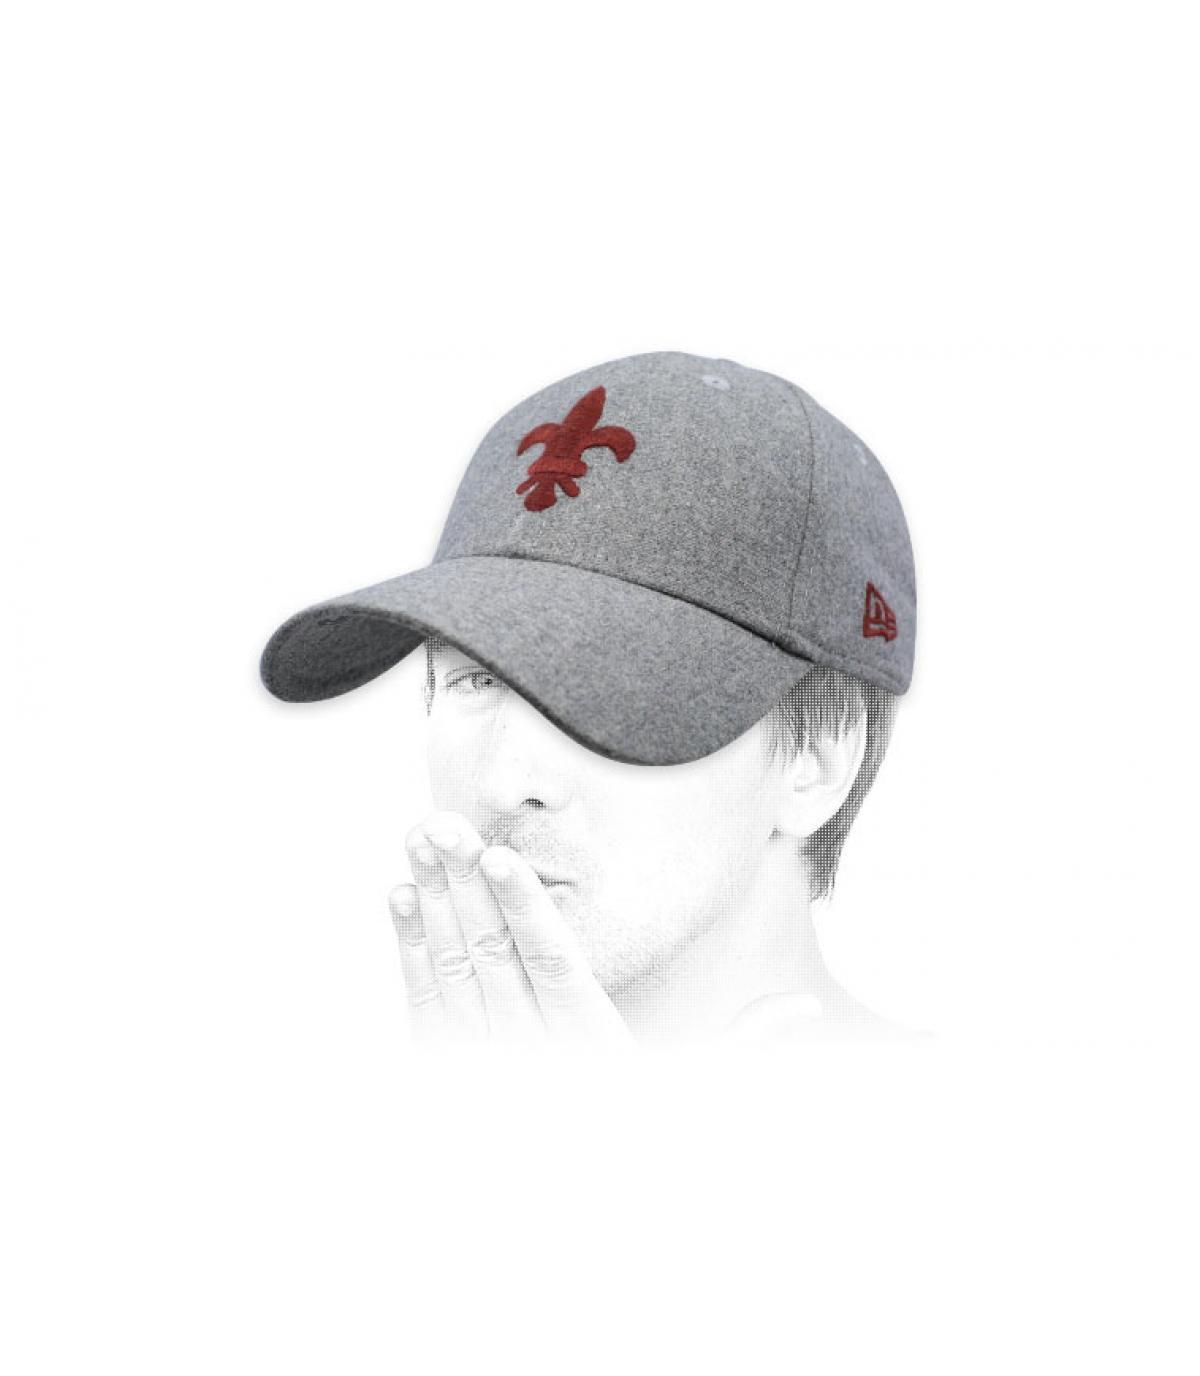 grey St Louis cap